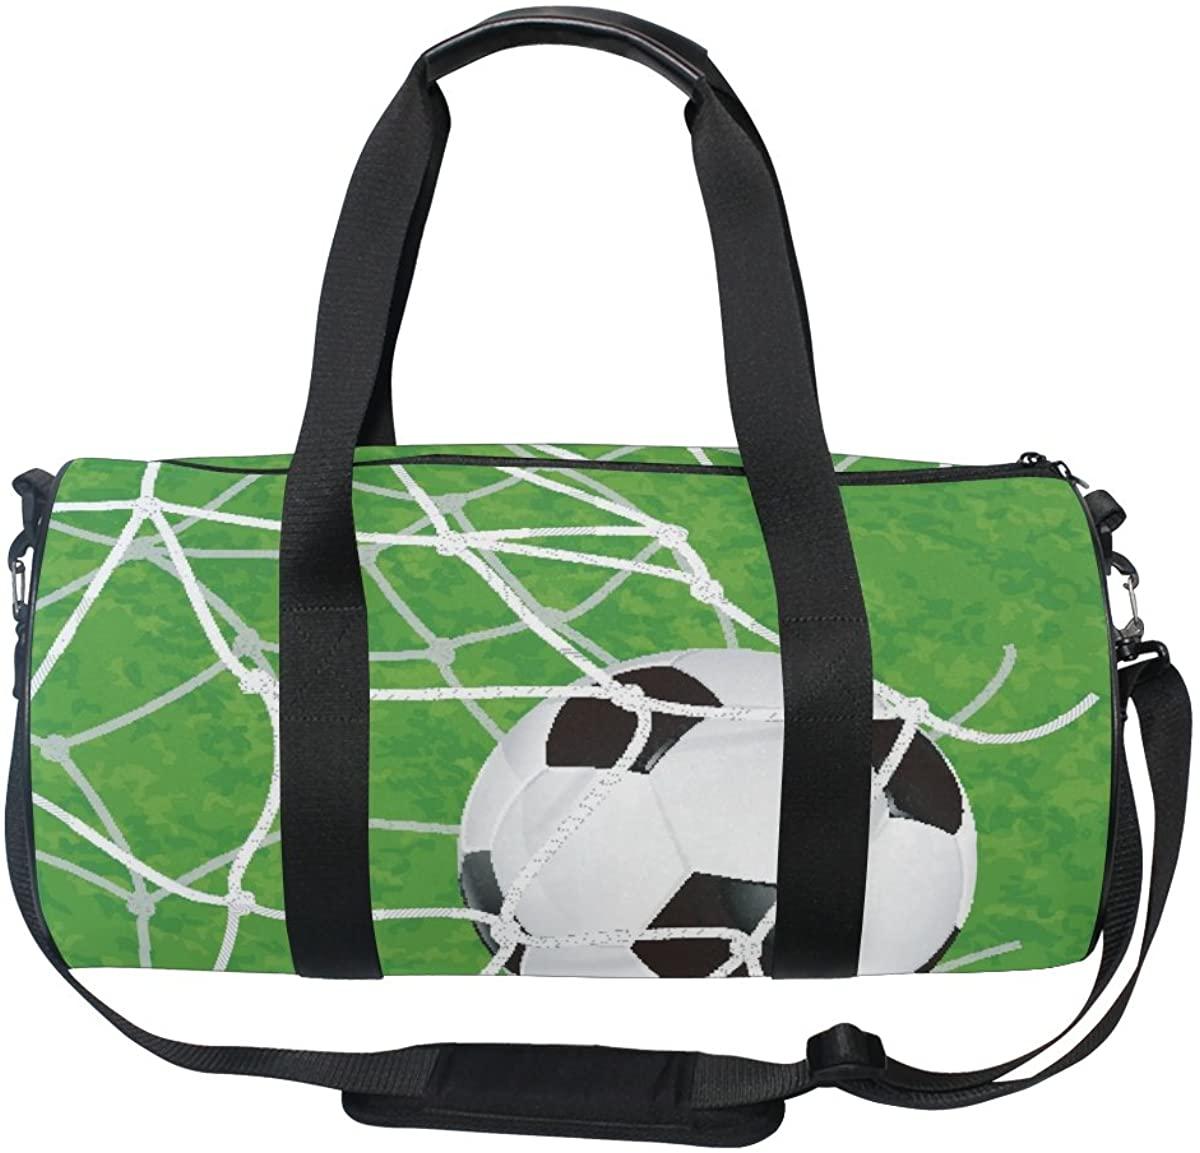 ALAZA Stylish Soccer Ball Sports Gym Duffel Bag Travel Luggage Handbag for Men Women